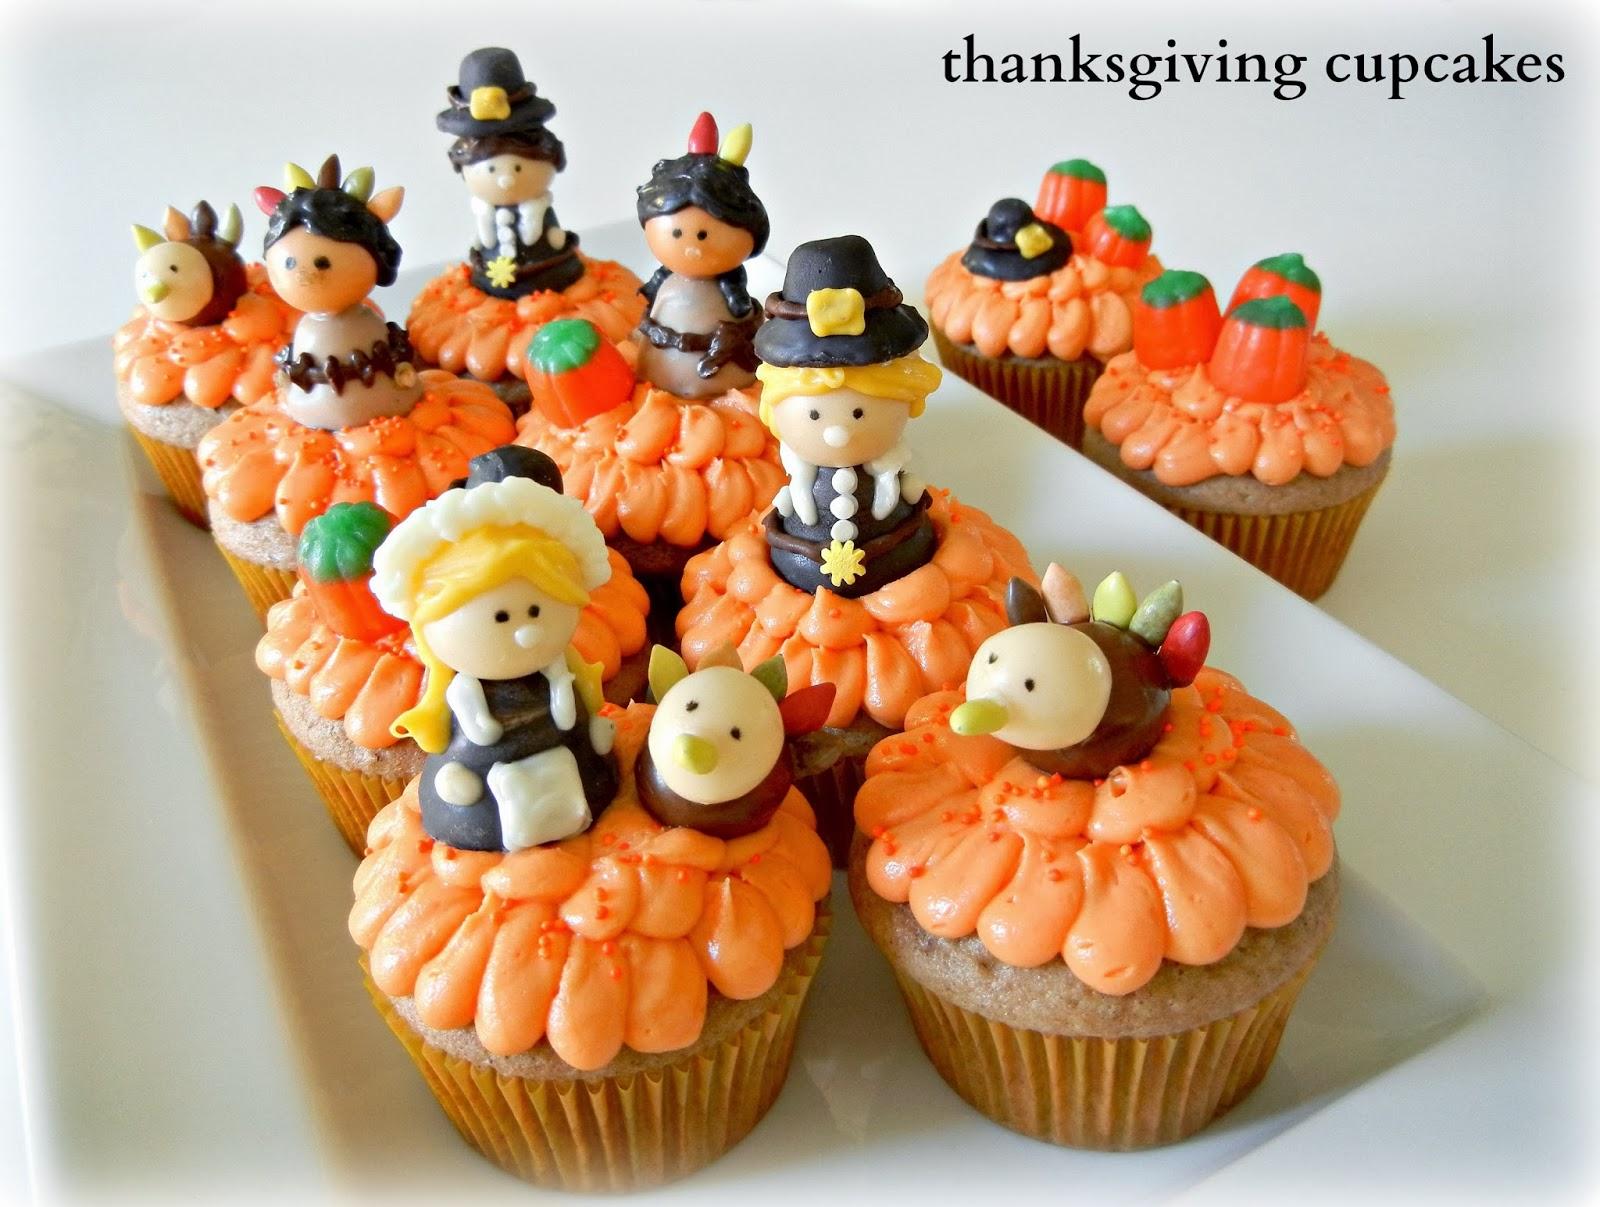 Sugar swings serve some thanksgiving cupcakes with for Decorations for thanksgiving cupcakes